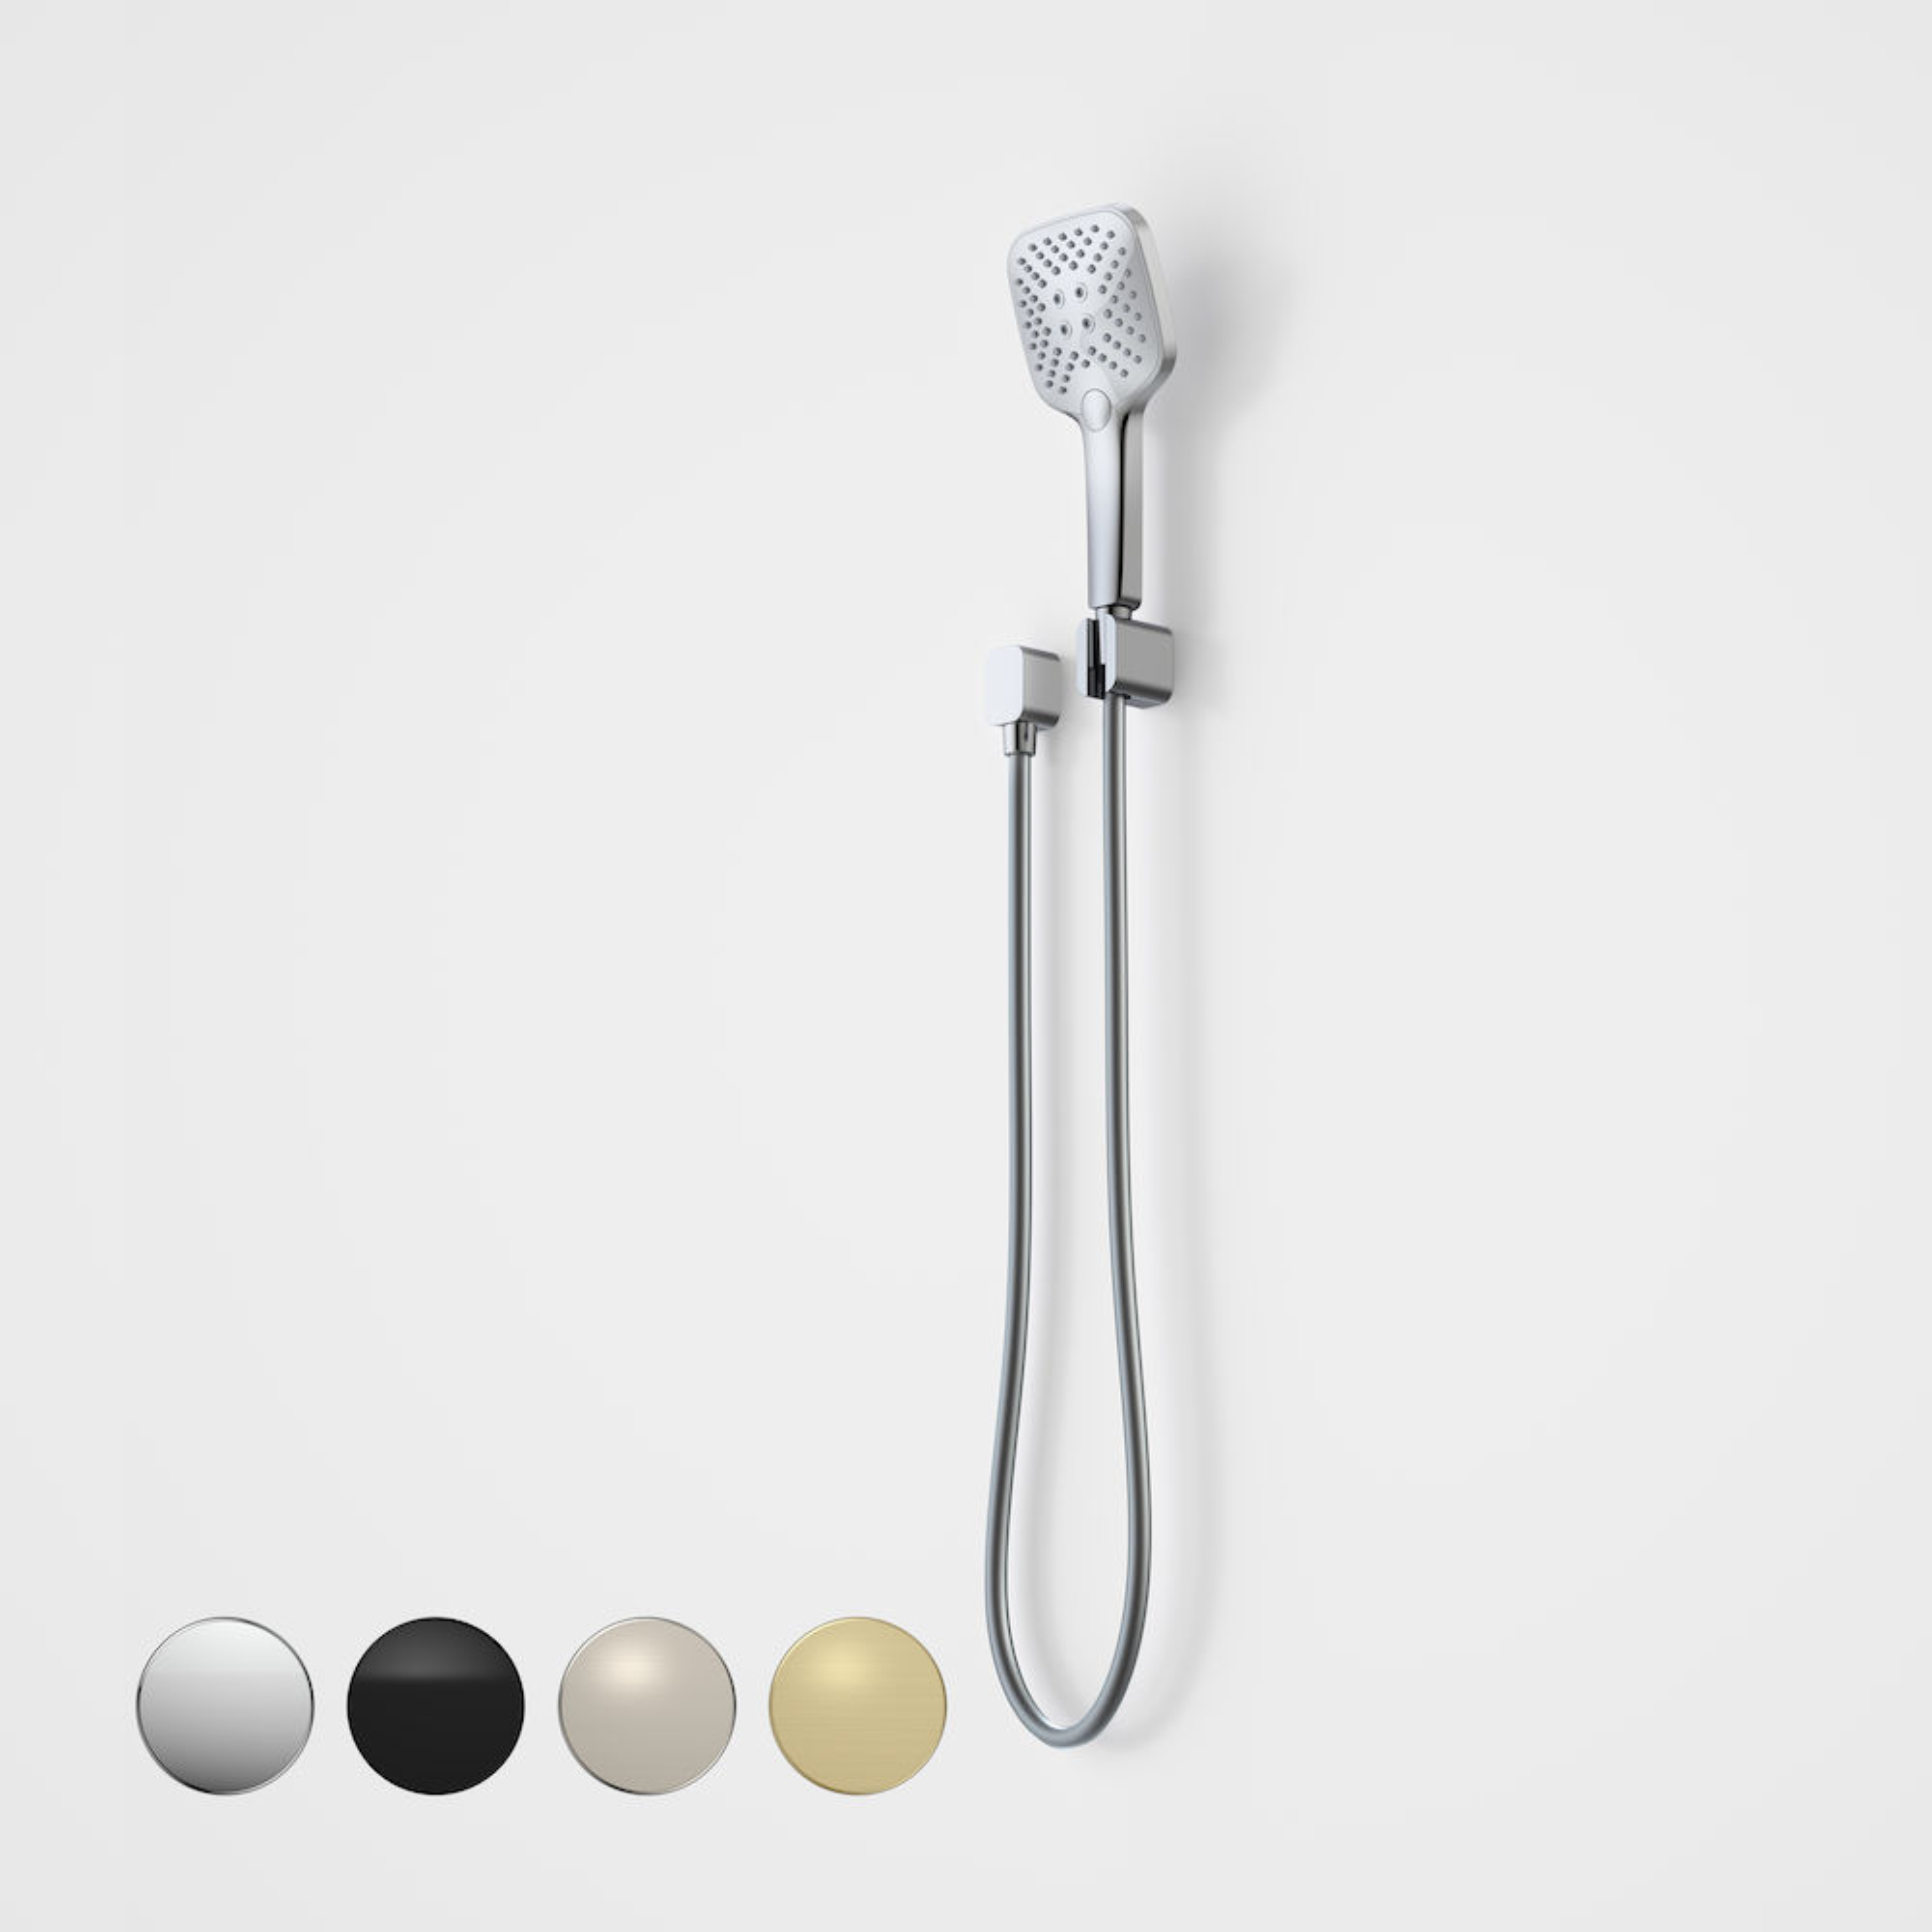 Luna Multi-function Hand Shower